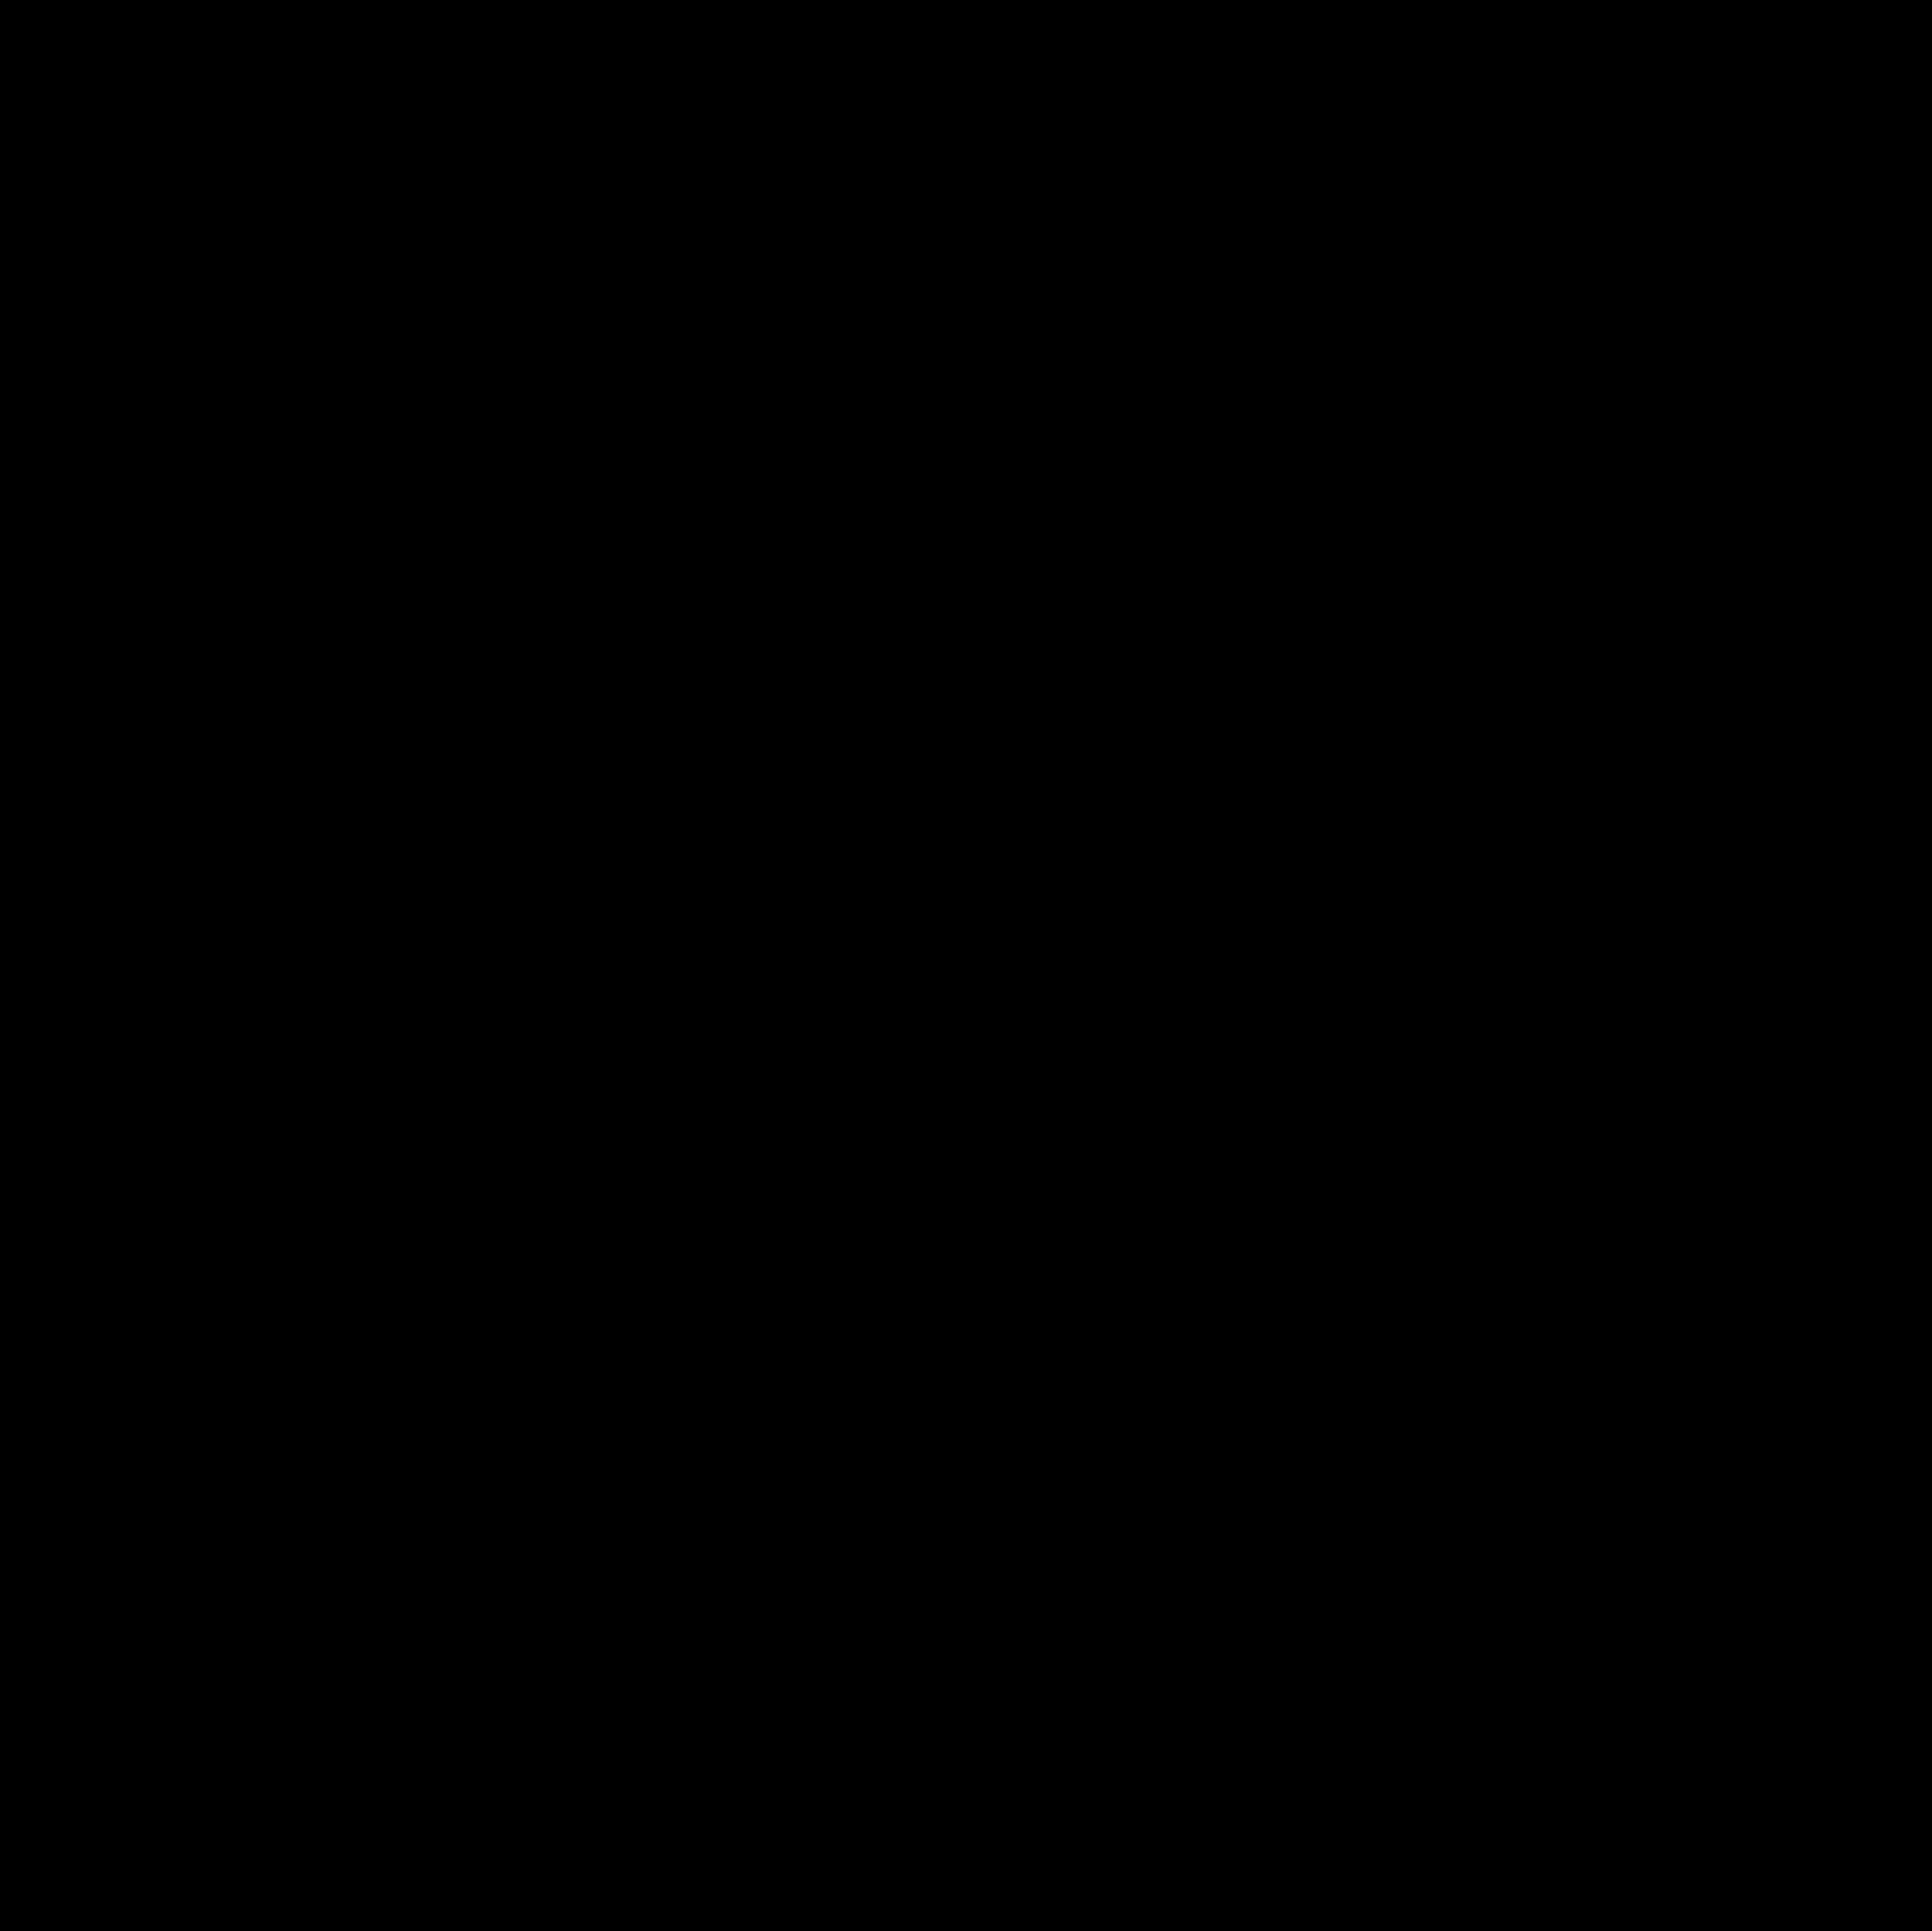 19001-2 Велика сумка з гобелену та джинсу (з овальним дном)